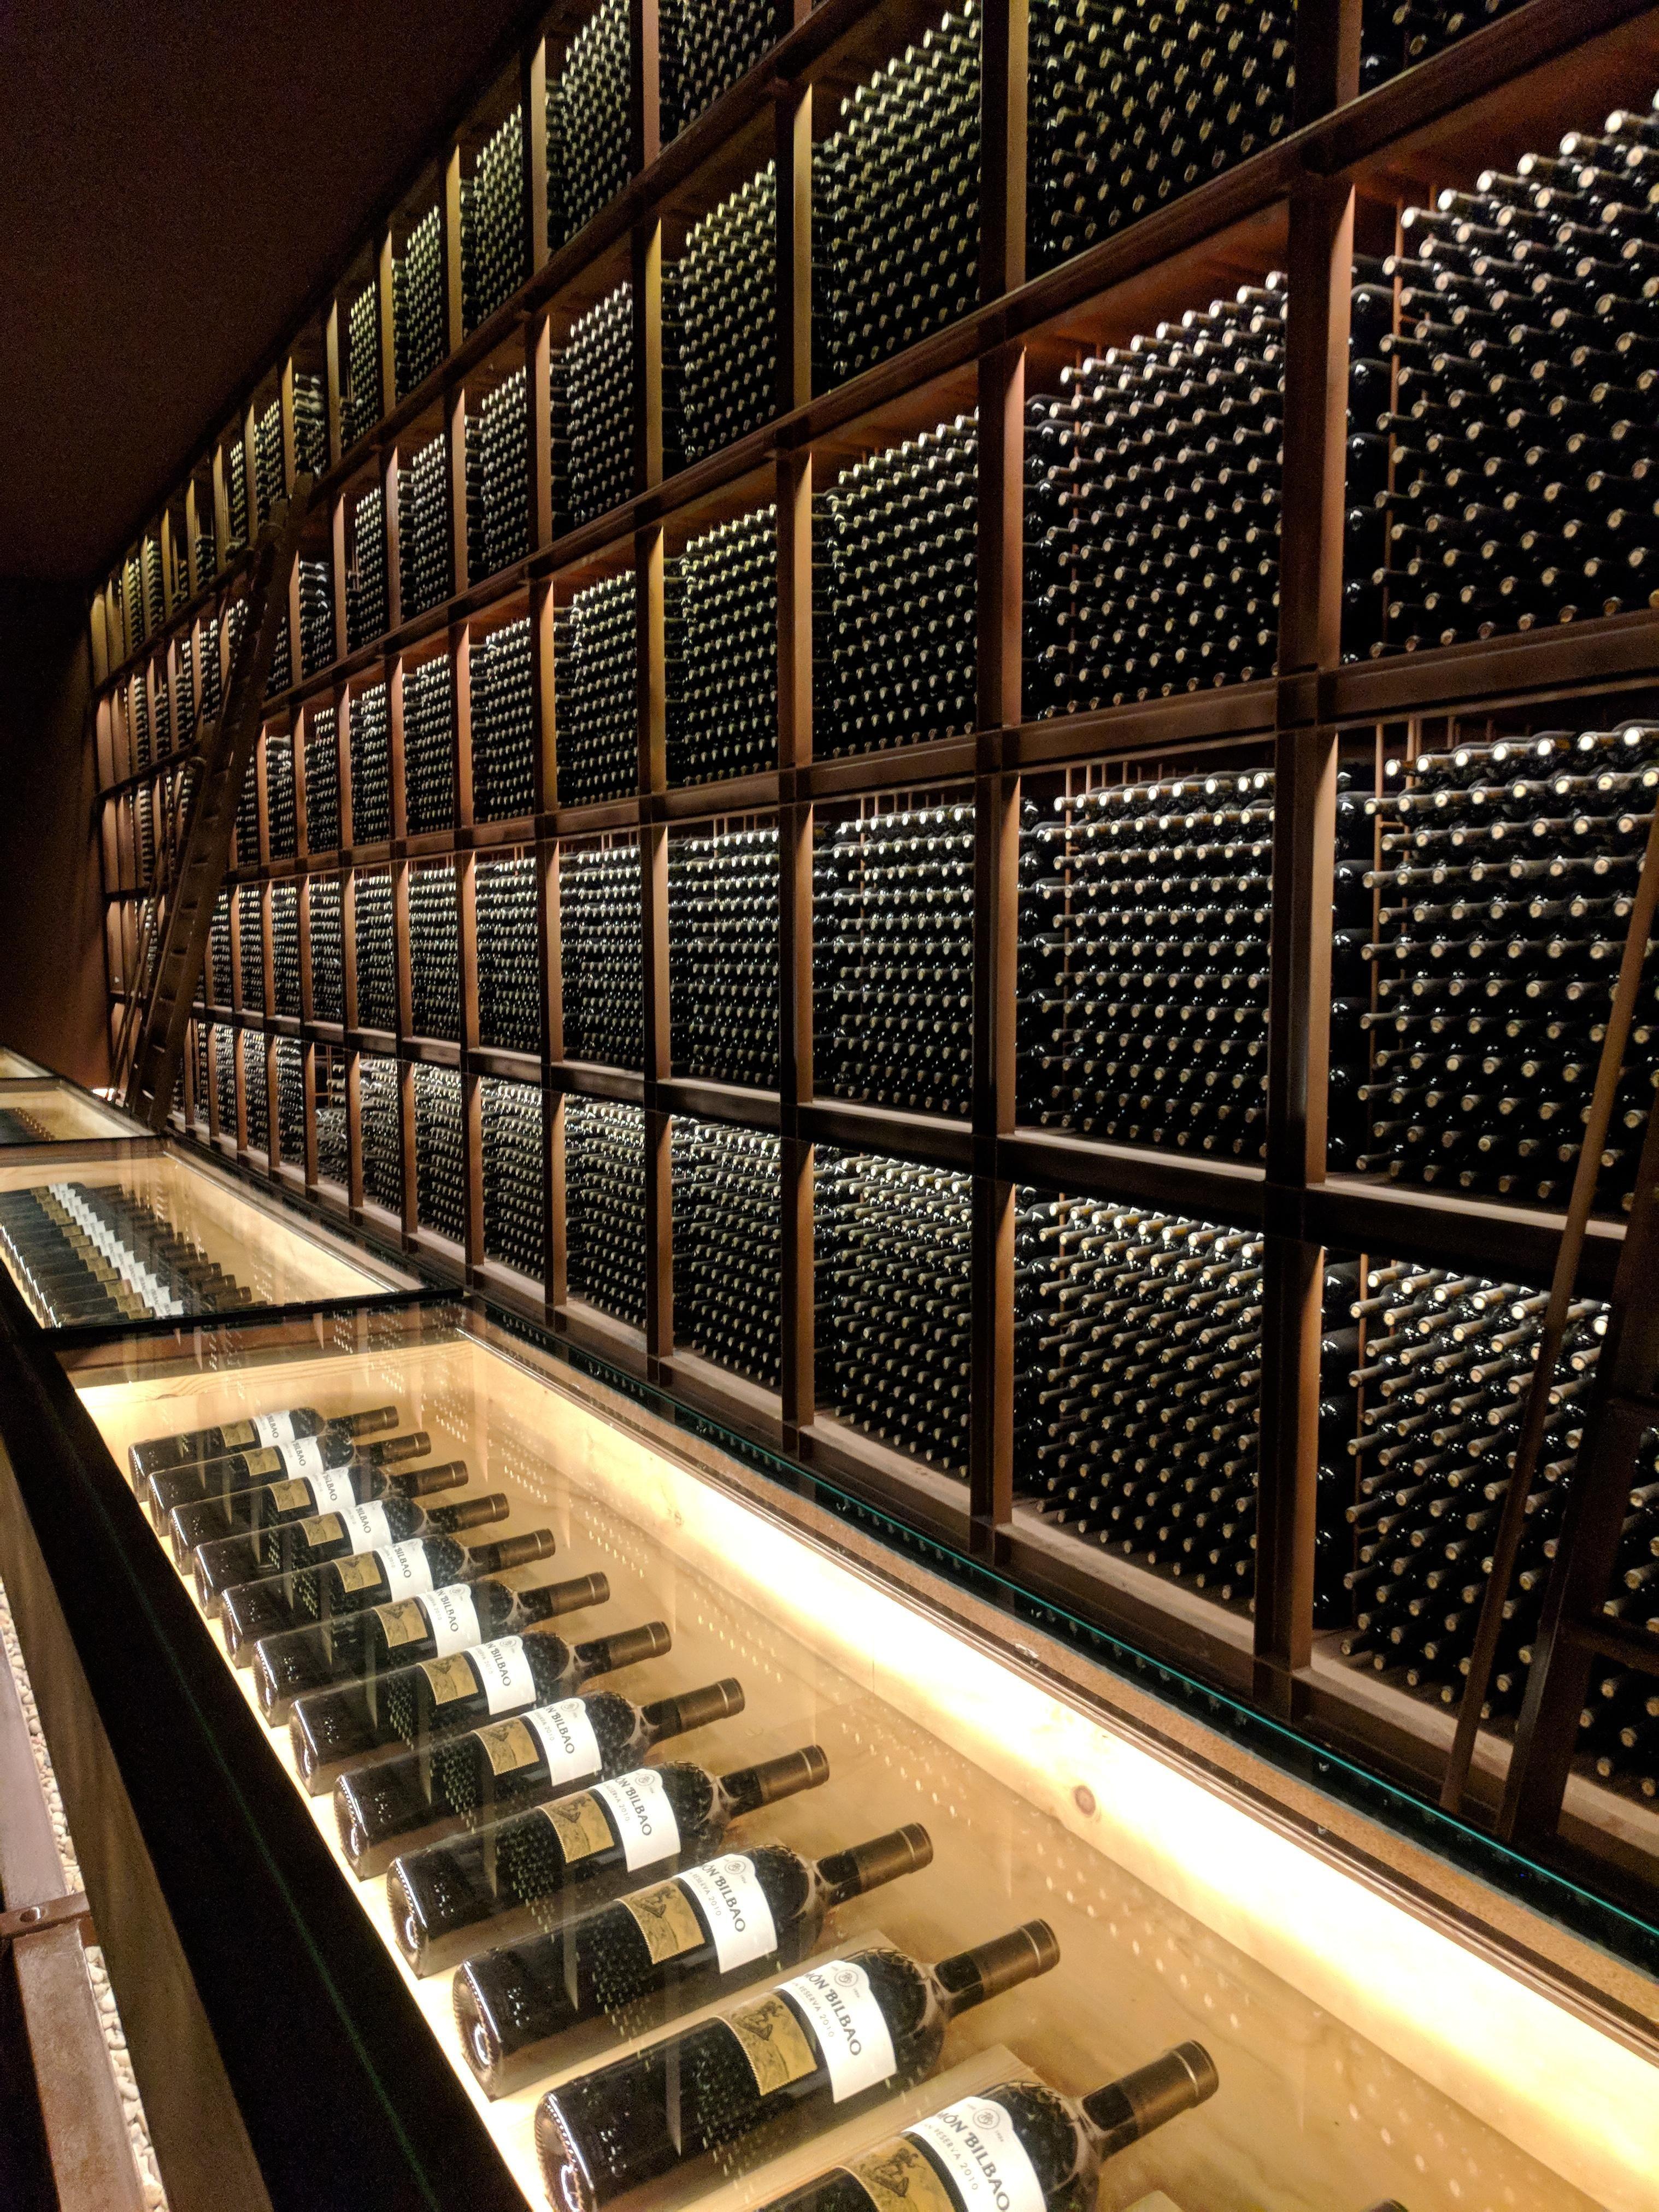 Itap Of The Wine Cellar Of A Vinyard In Rioja